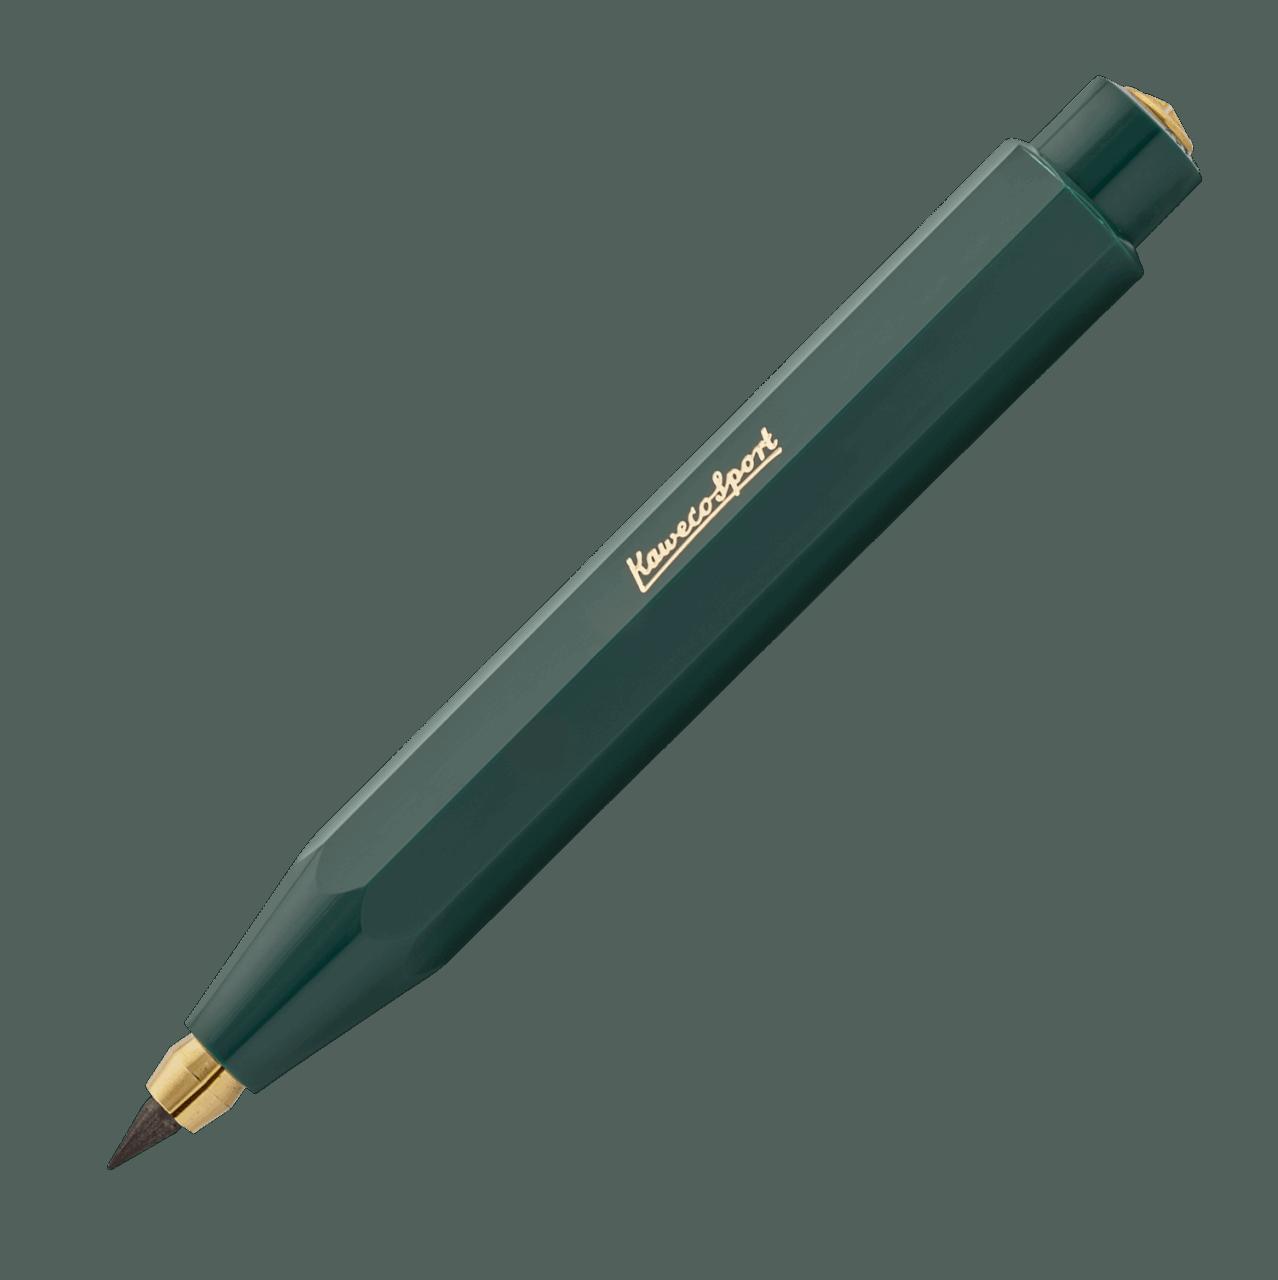 Kaweco CLASSIC SPORT Clutch Pencil Green 3.2 mm